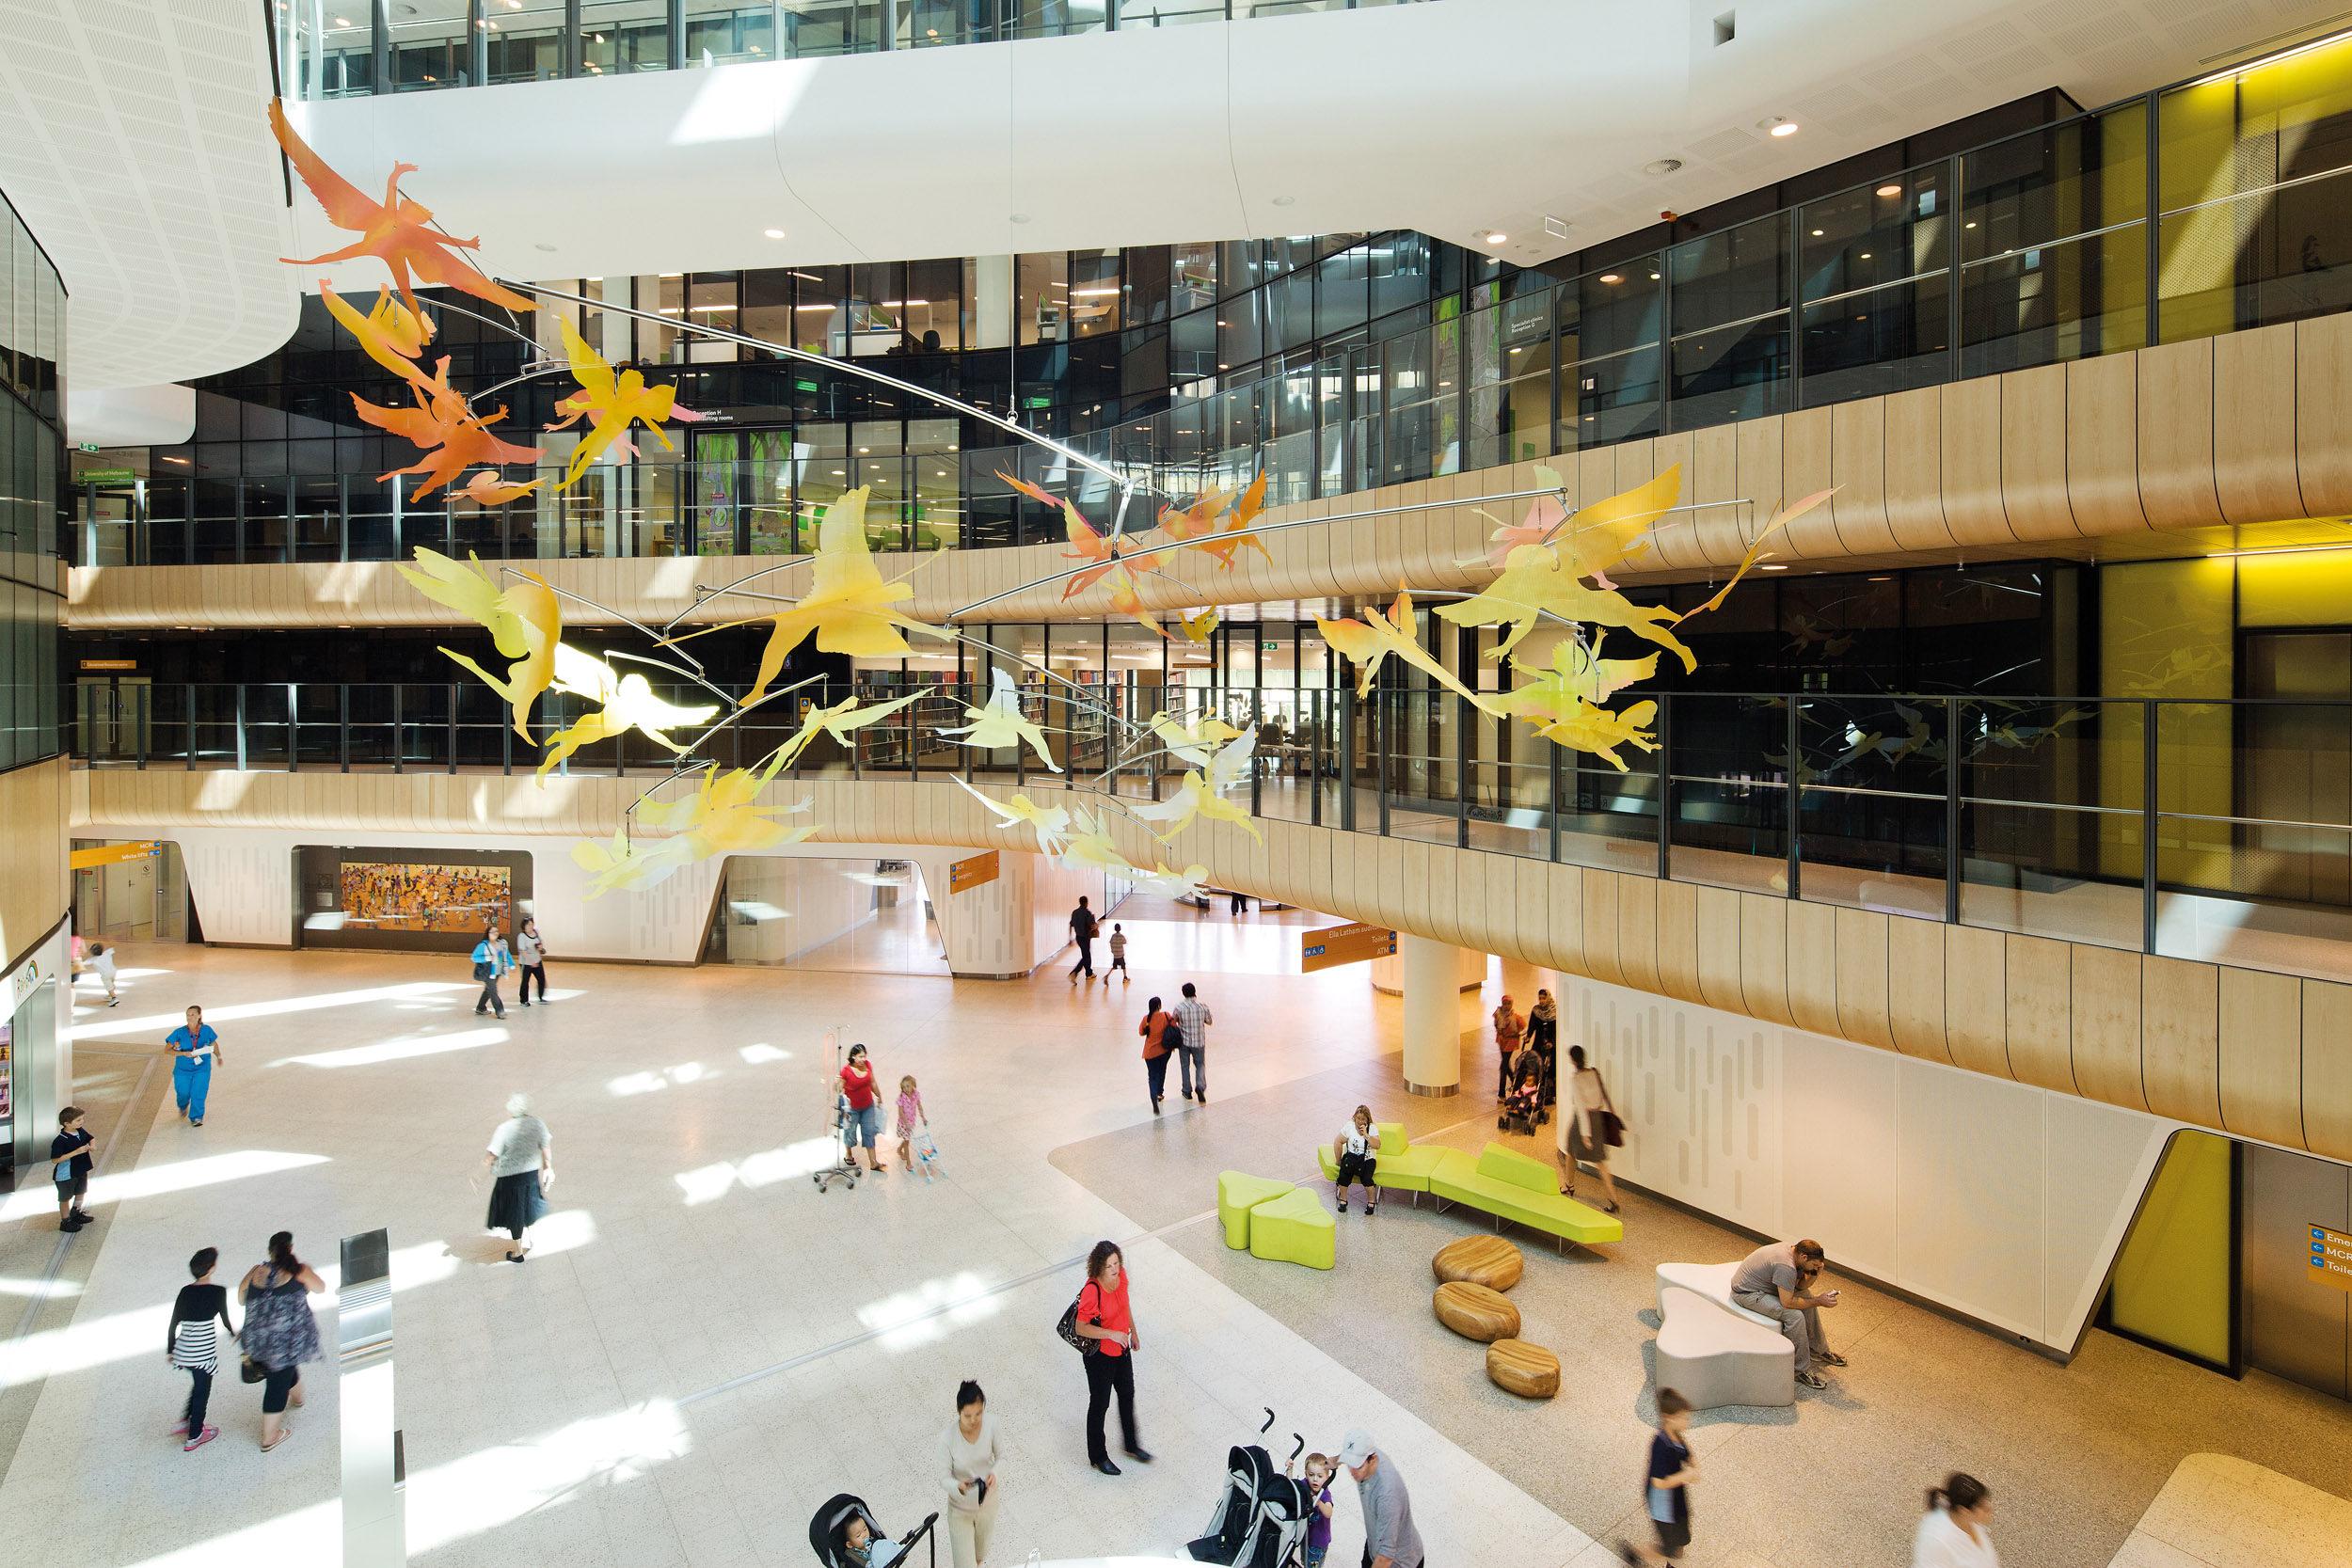 Royal Children's Hospital Public Art Atrium BLP